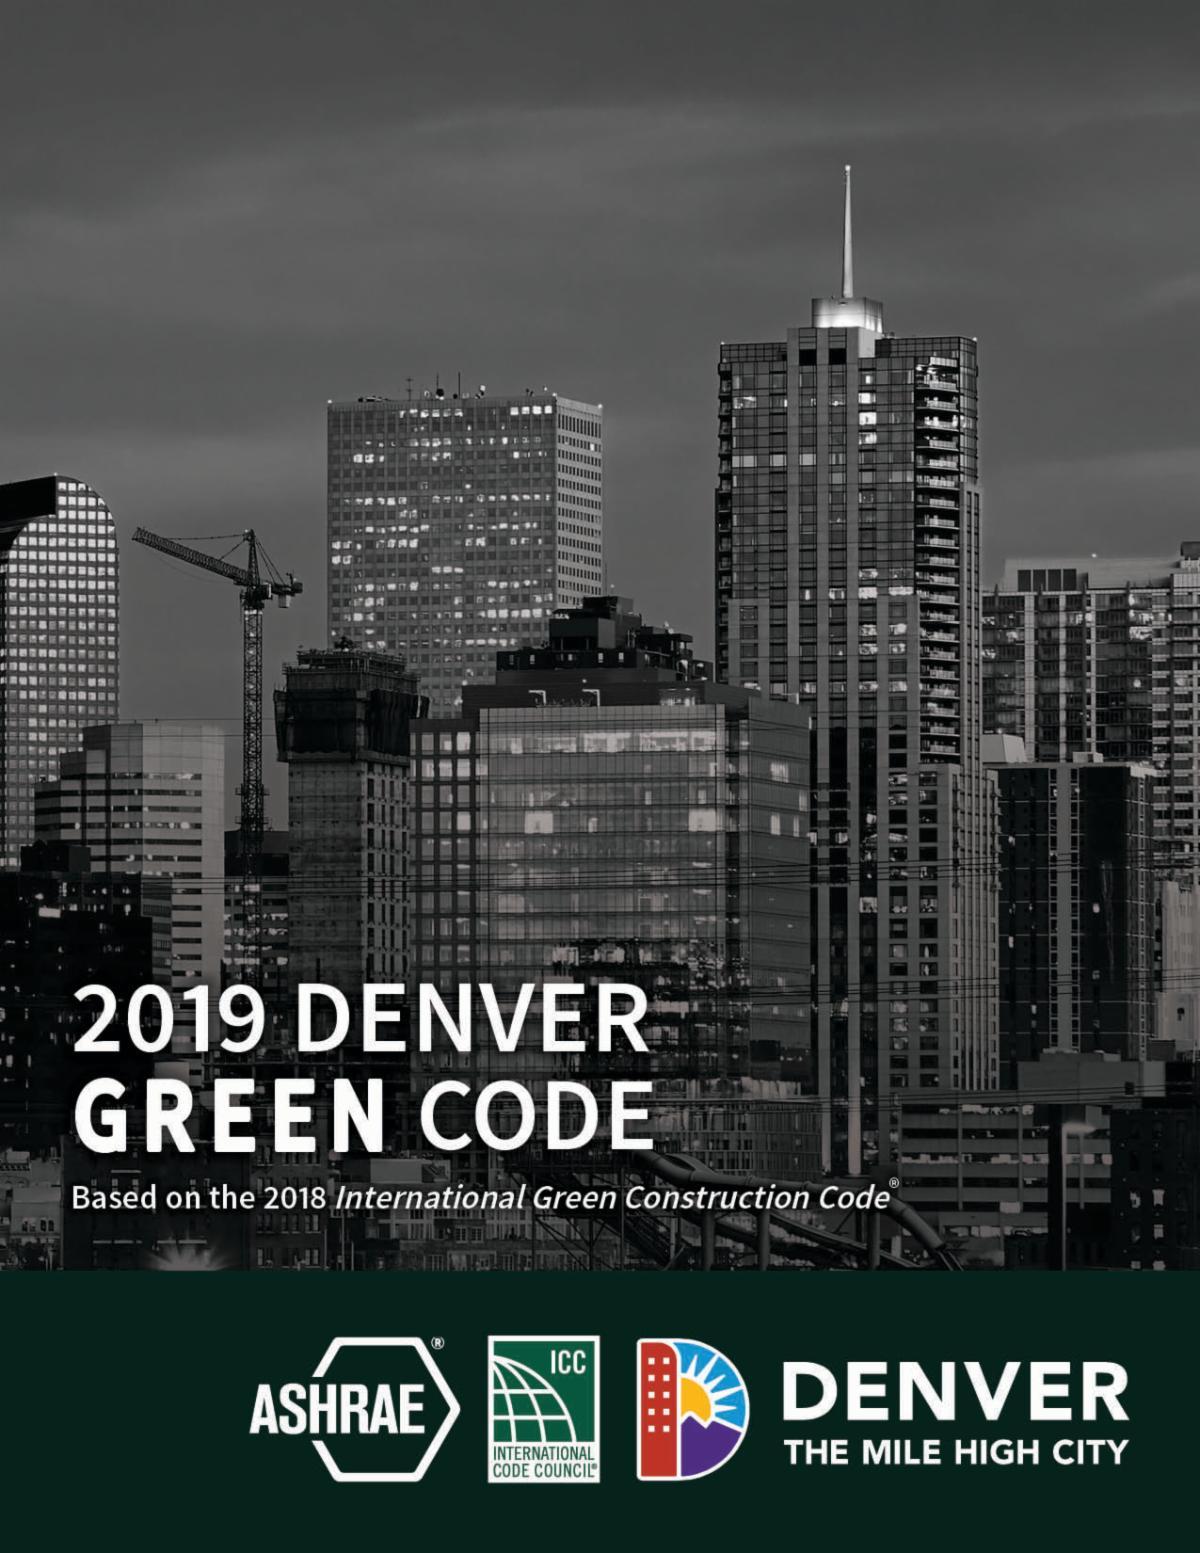 2019 Denver Green Code